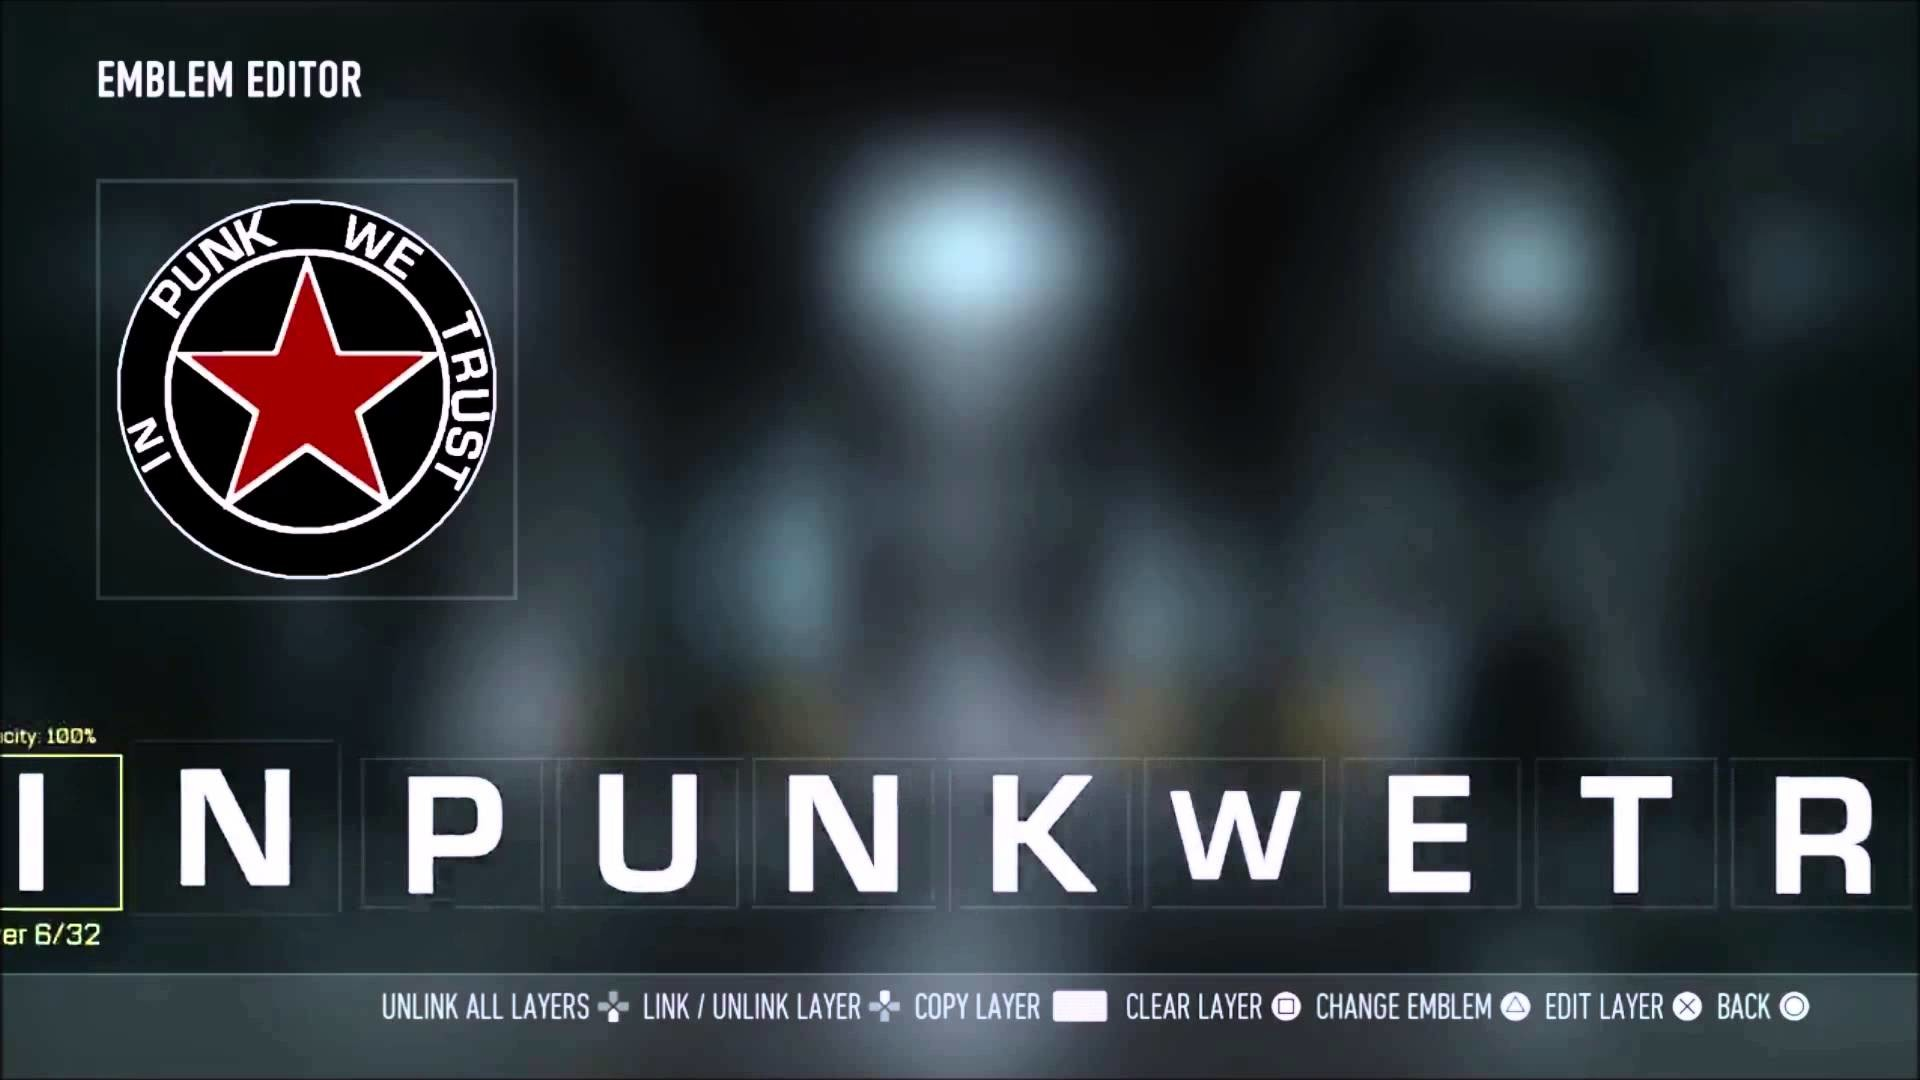 Call Of Duty Advanced Warfare – Cm Punk Emblem